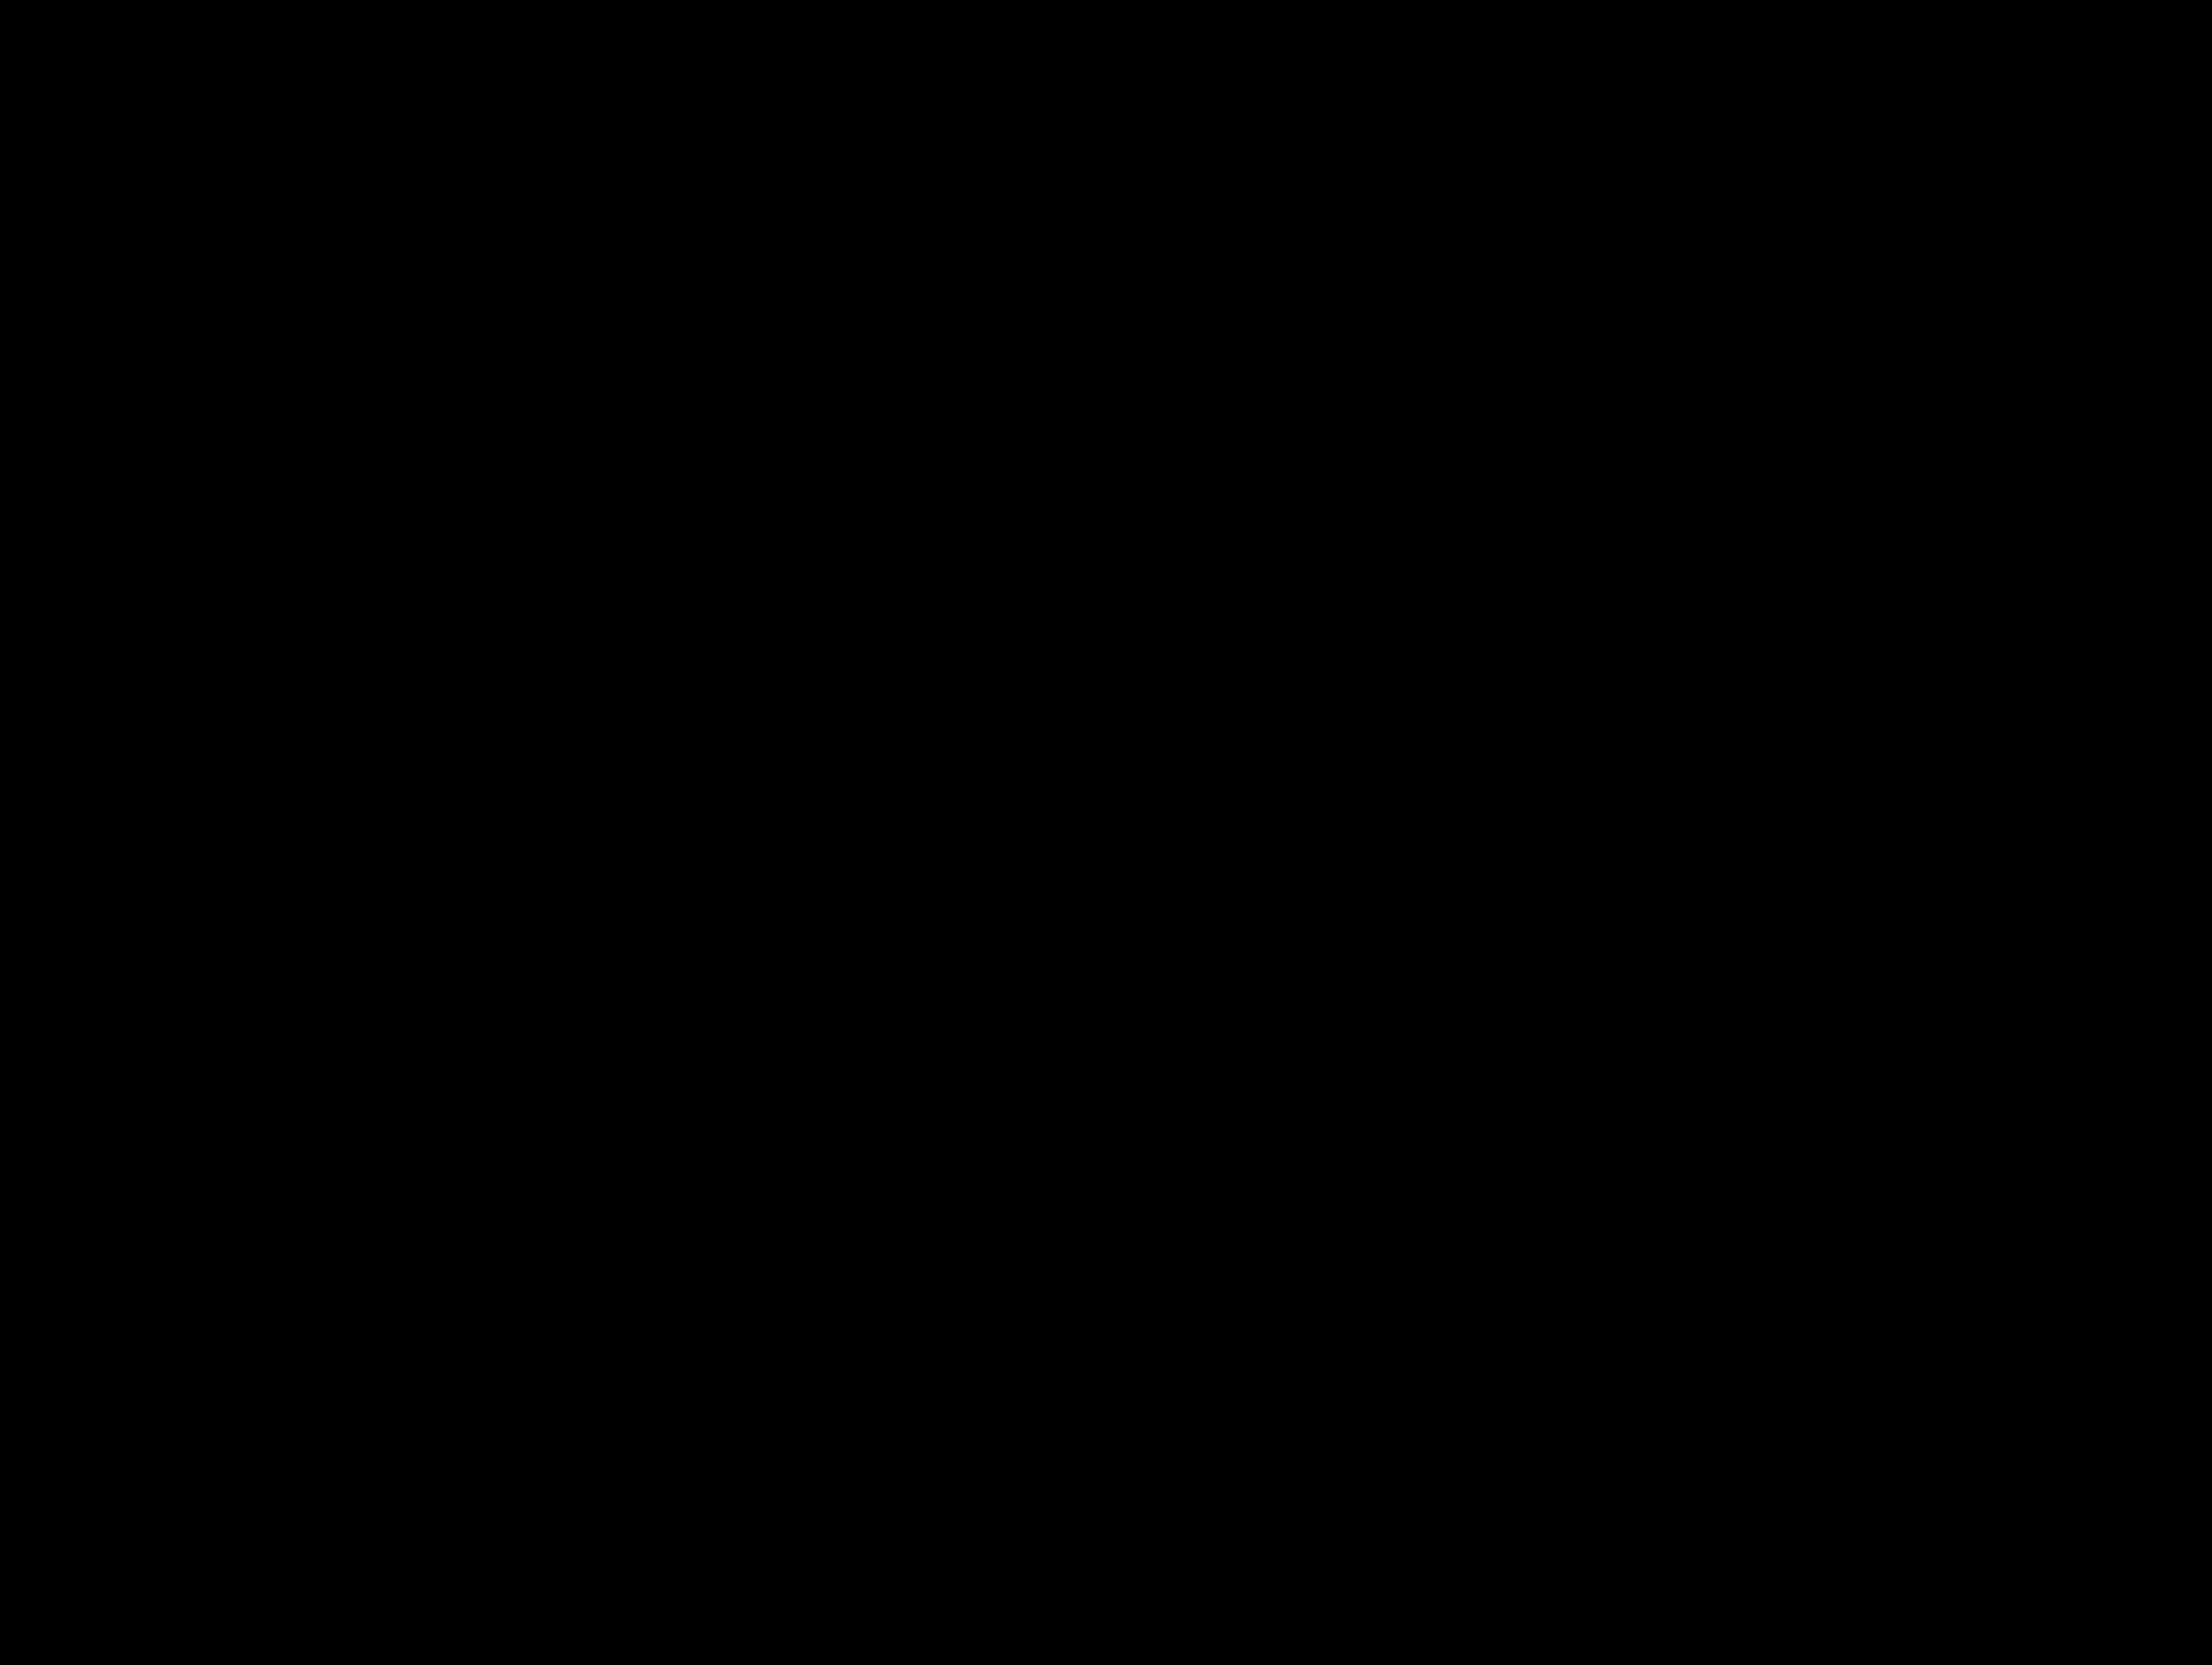 2396x1803 Clipart